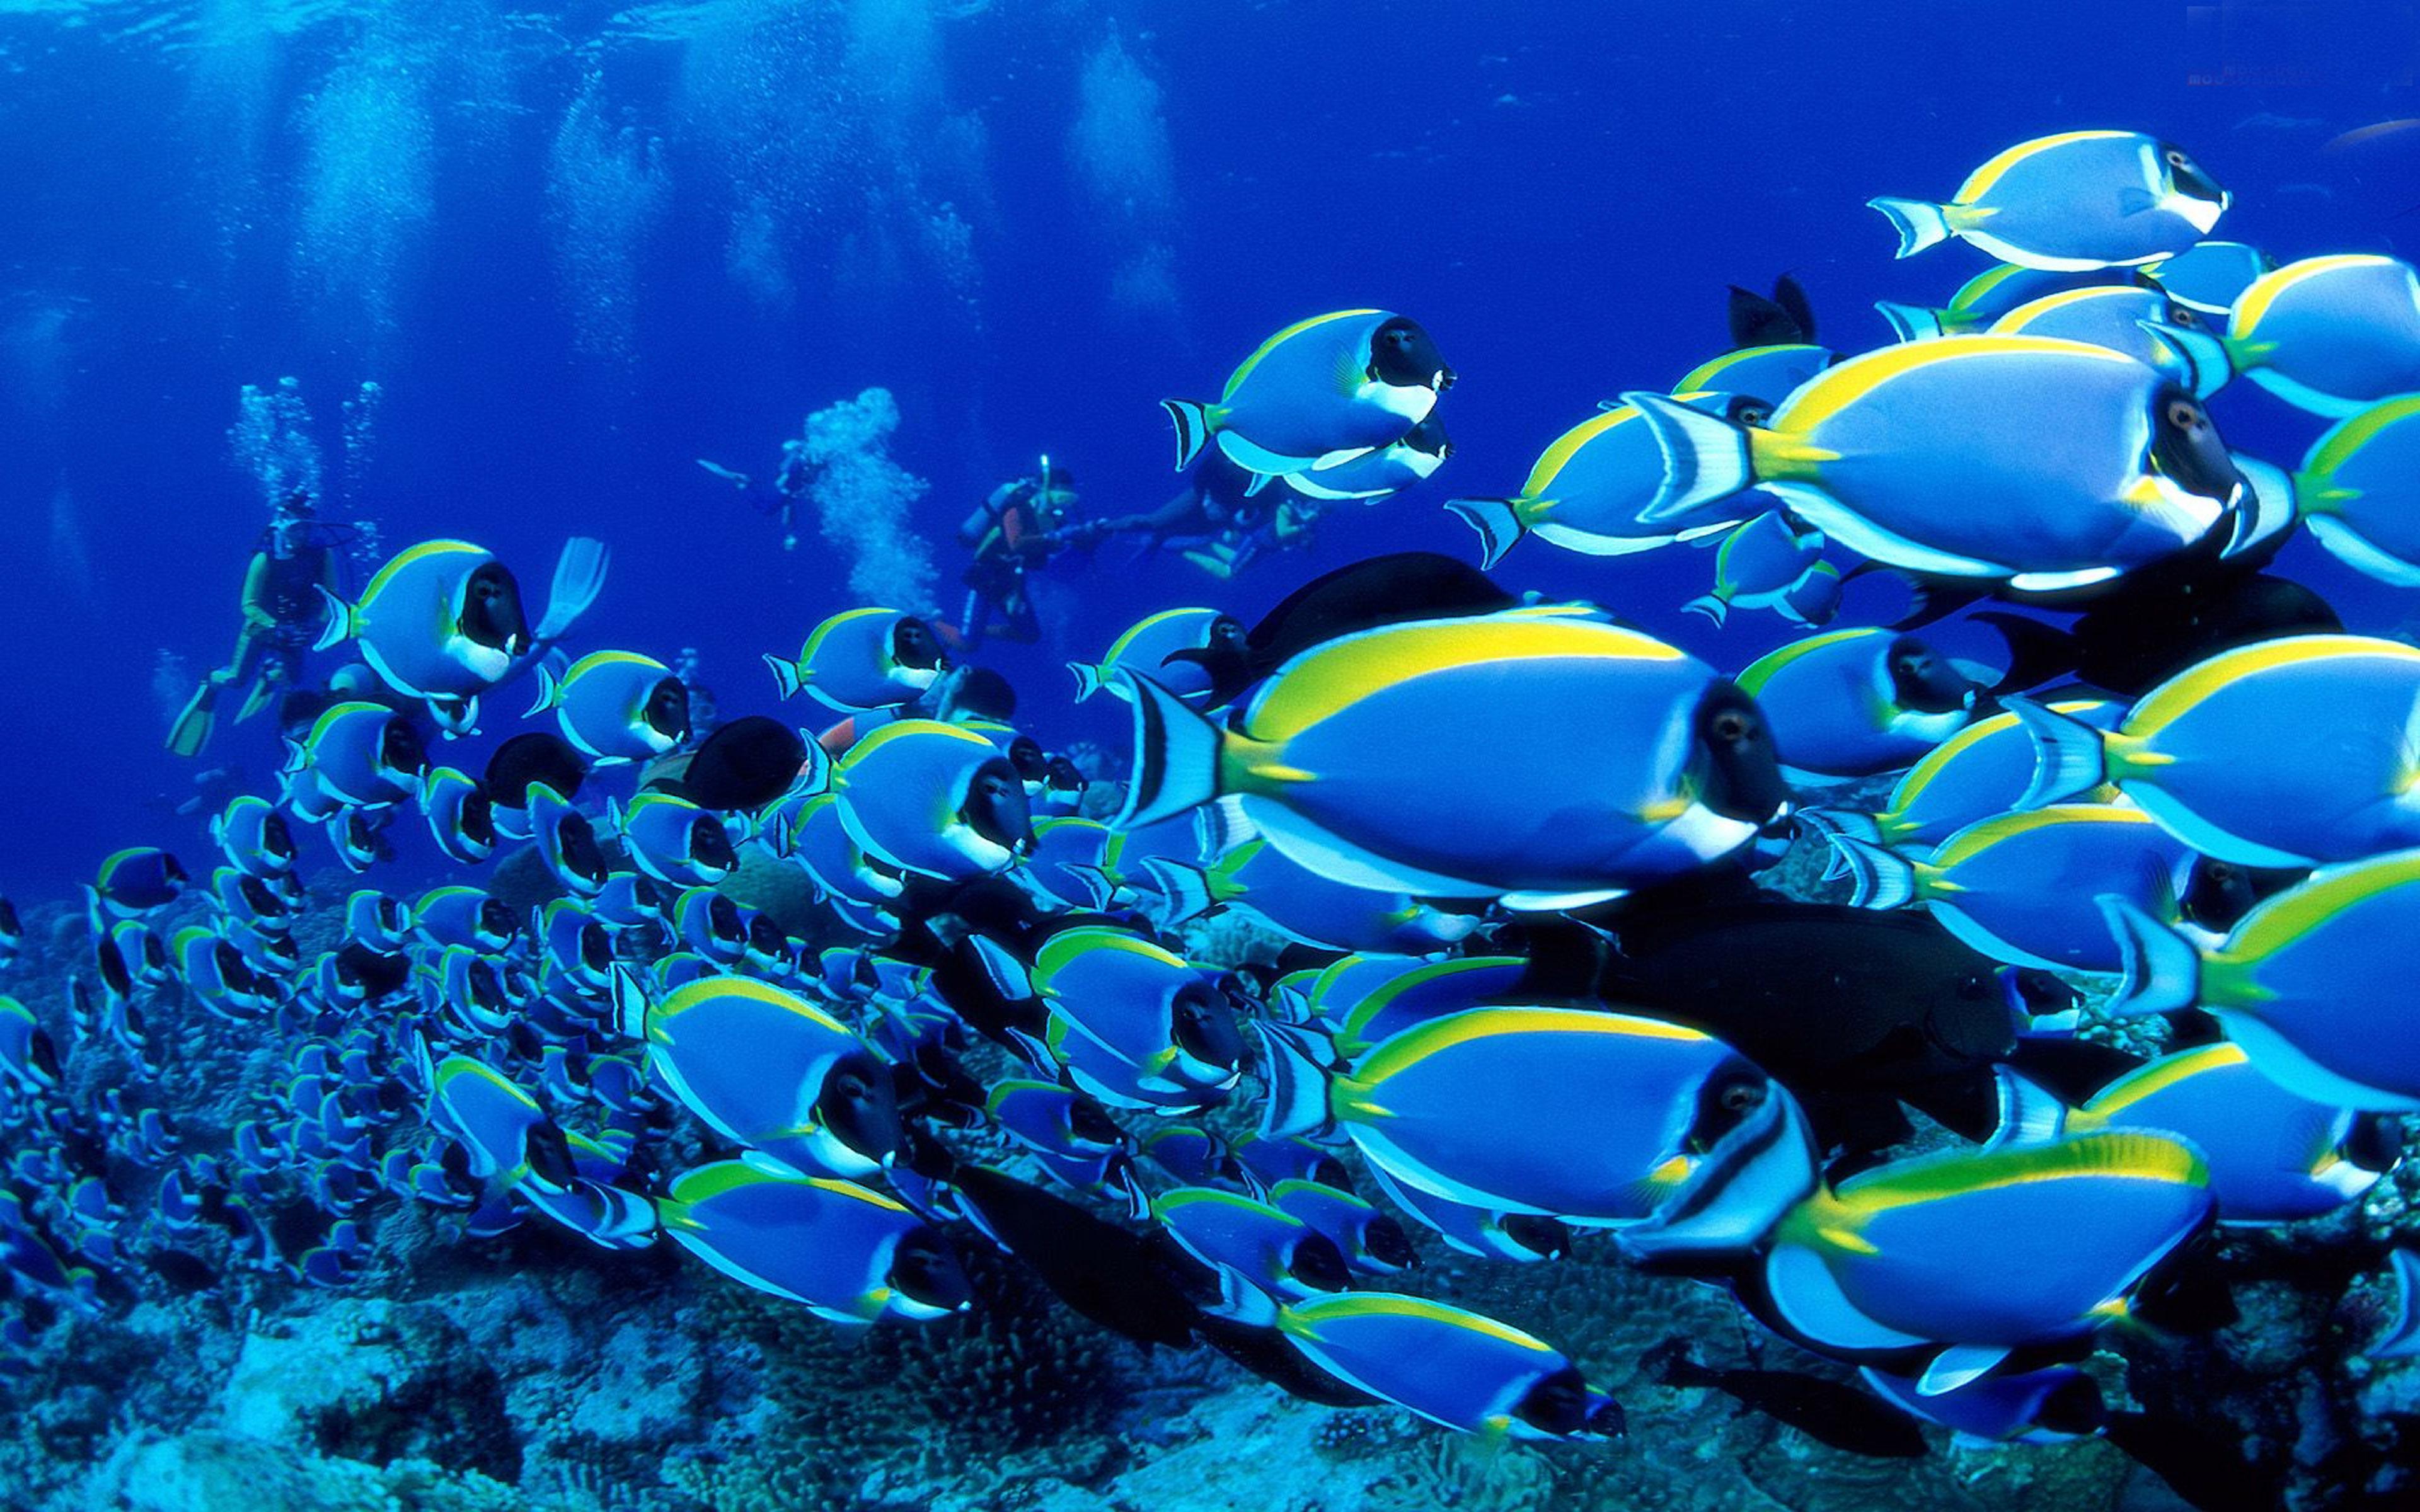 Animals Ocean Tropical Fish Wallpaper Background Hd - Wallpaper , HD Wallpaper & Backgrounds